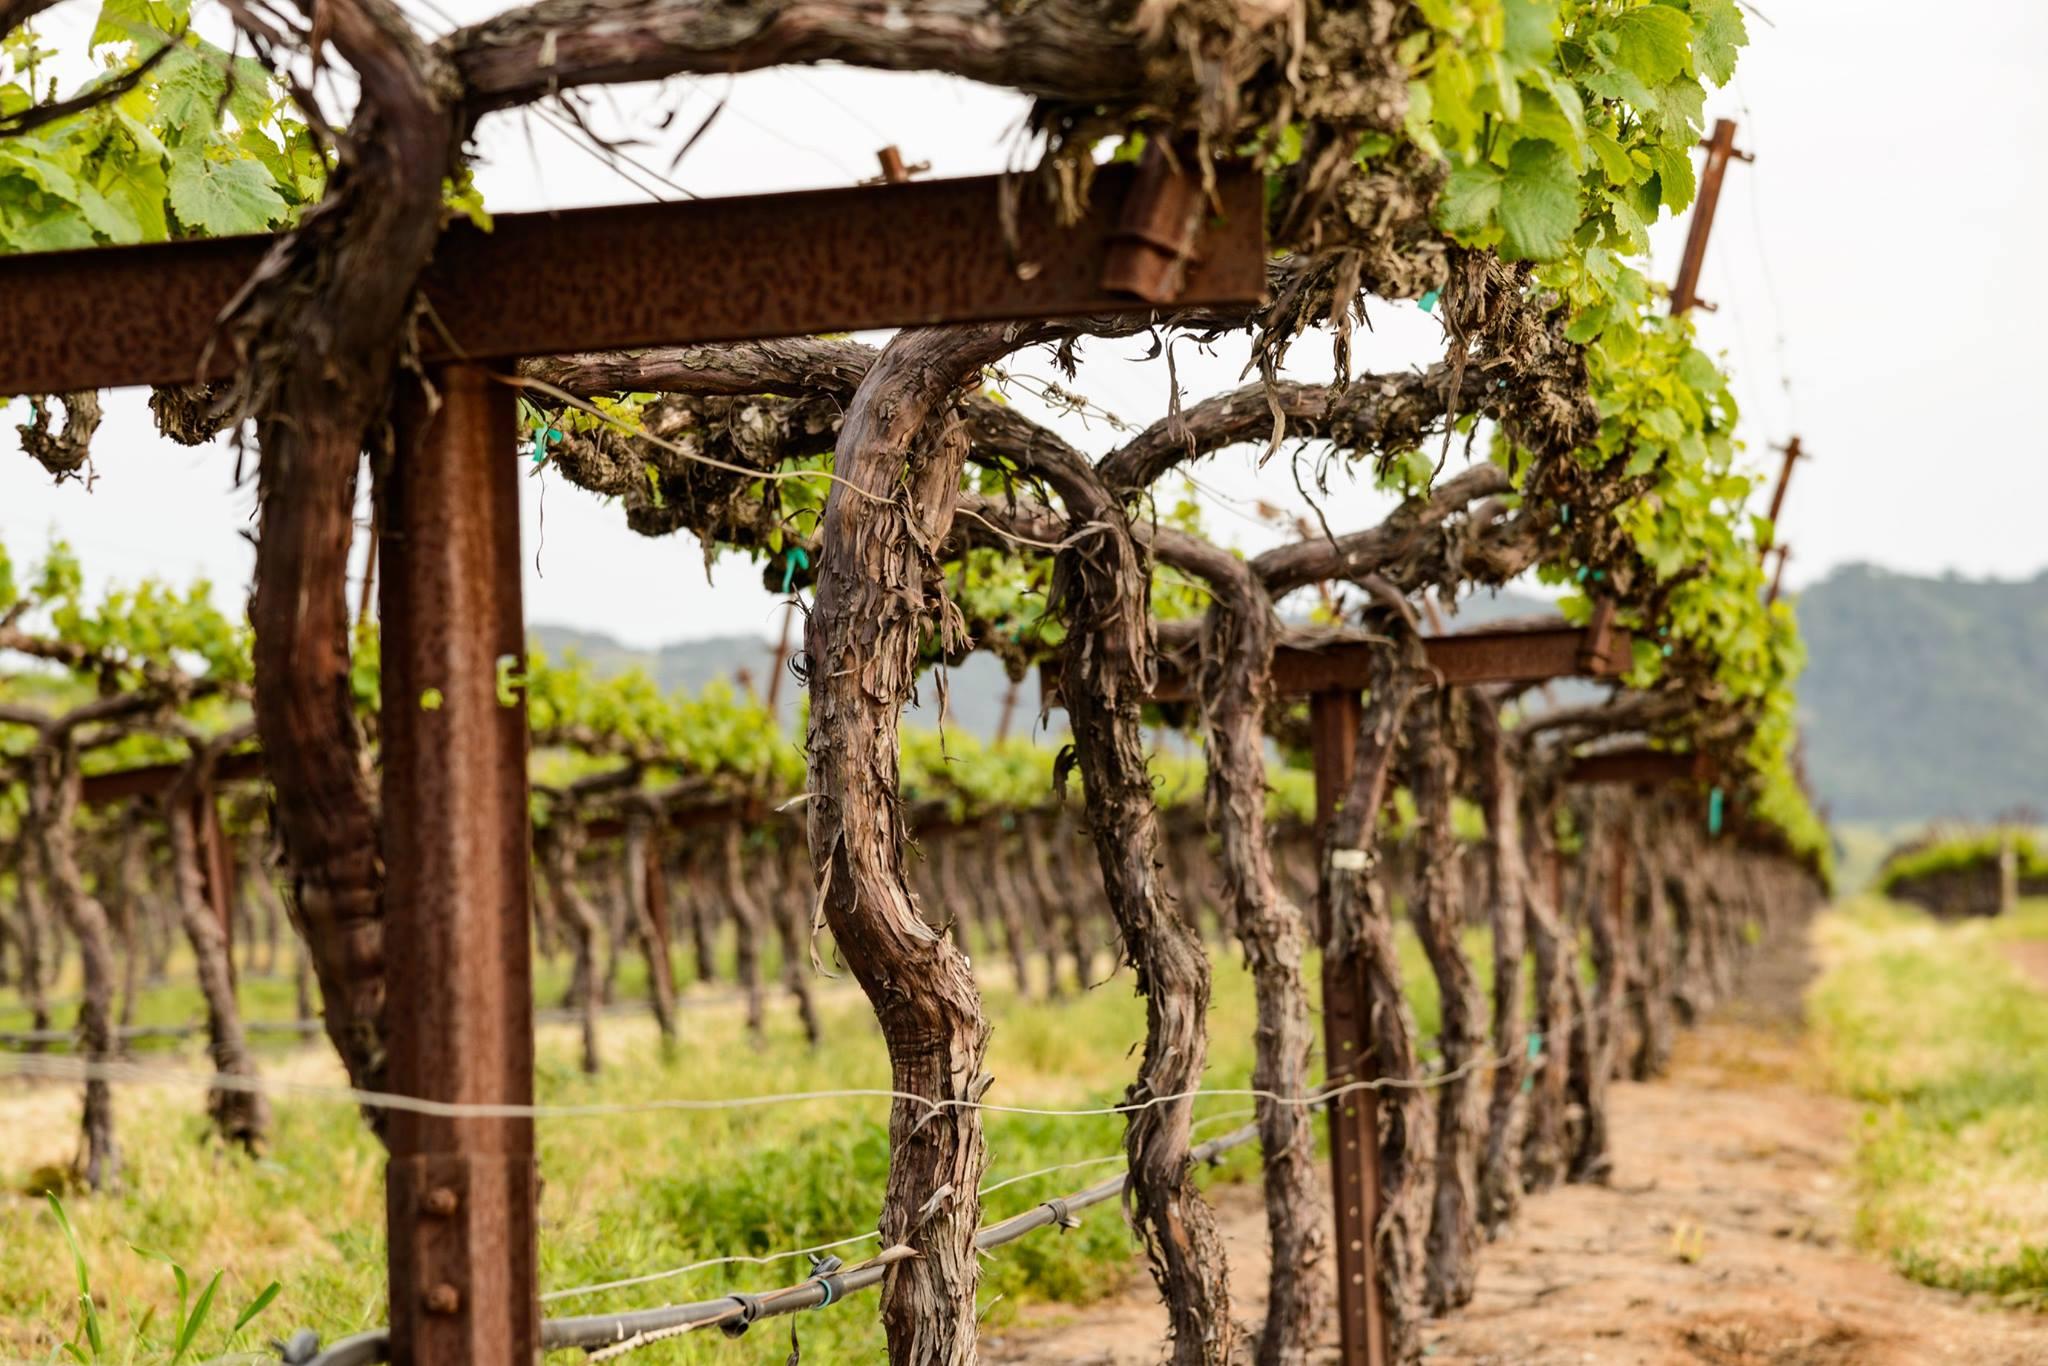 Tolosa's vineyards